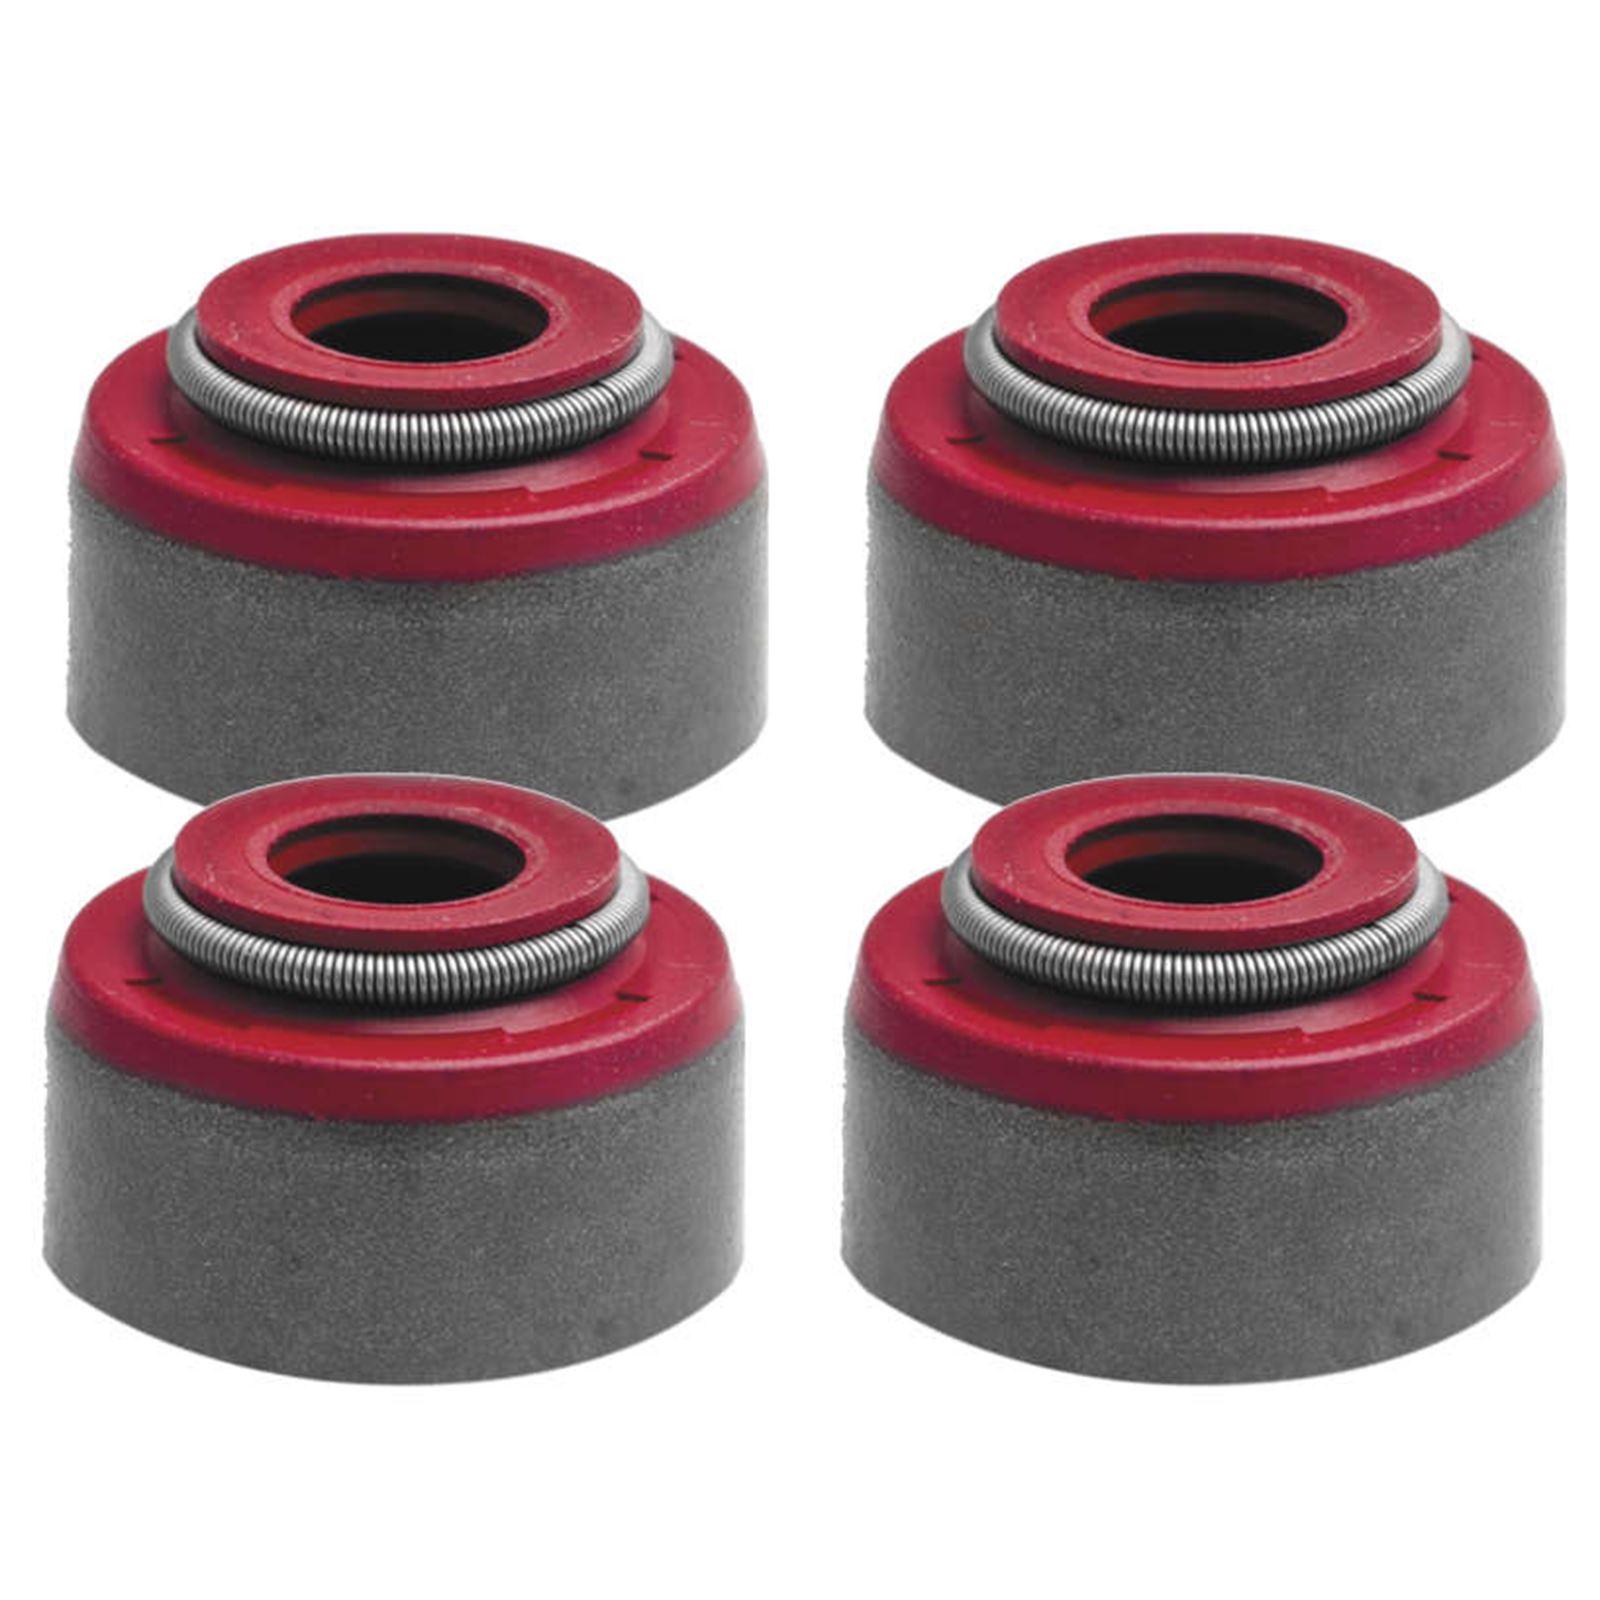 KPMI Intake/Exhaust Valve Stem Seal